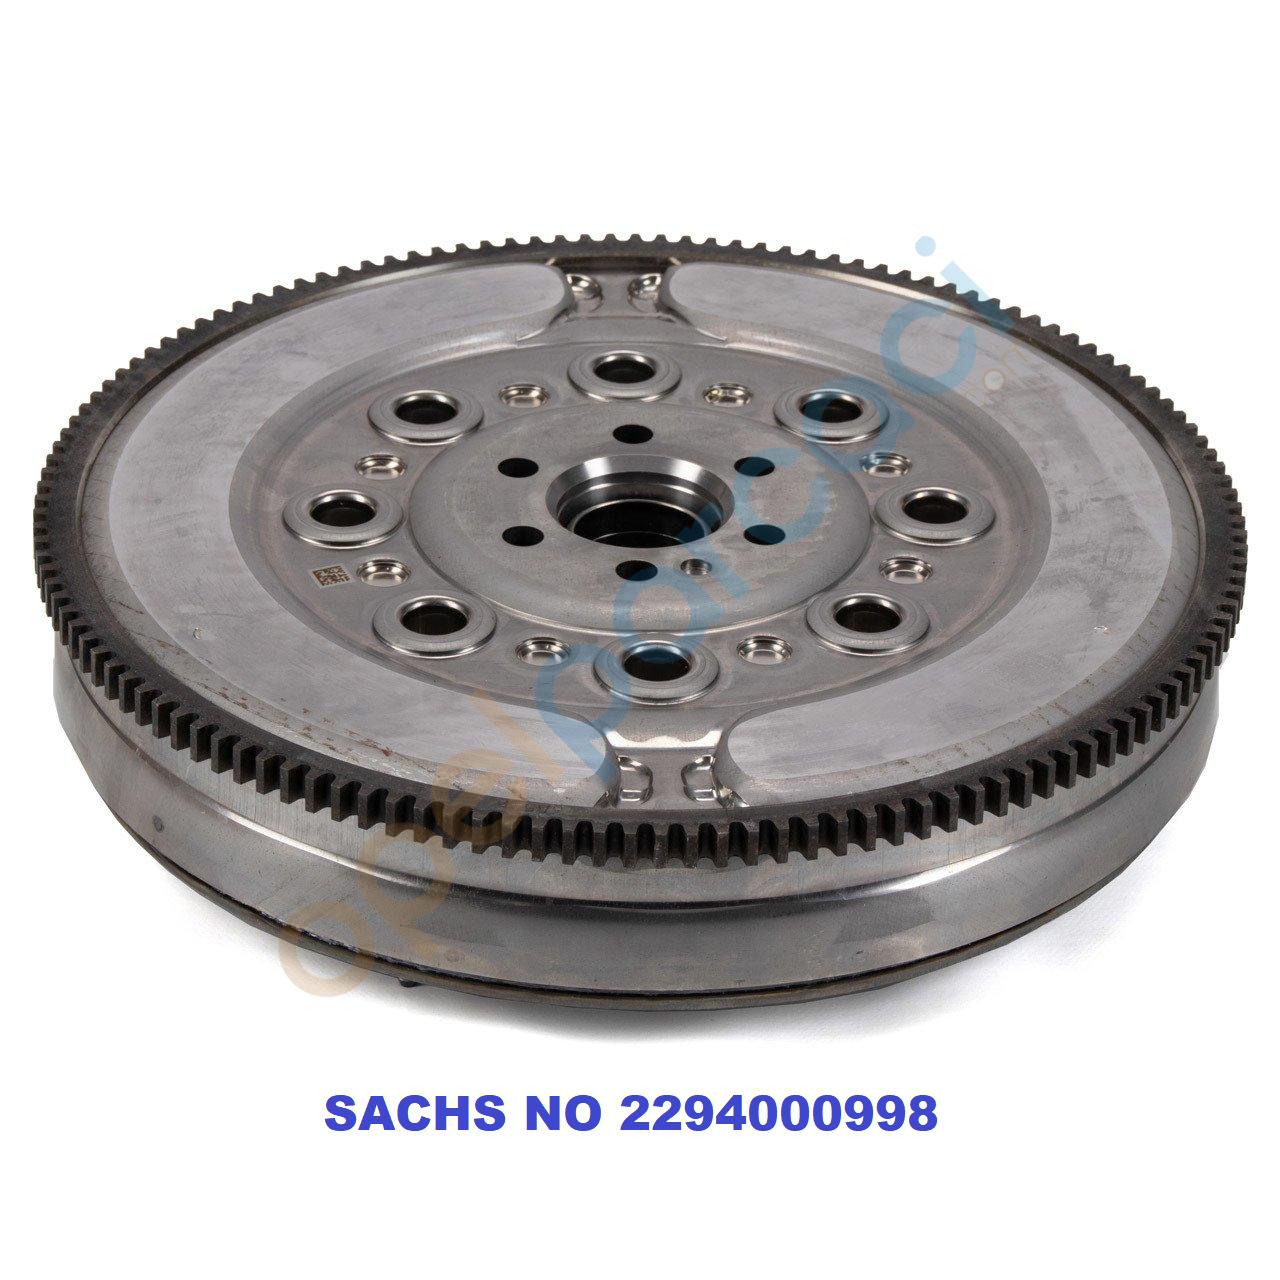 Opel Zafira C 1.6 Turbo Benzinli Takviyeli Volan SACHS 2294000998